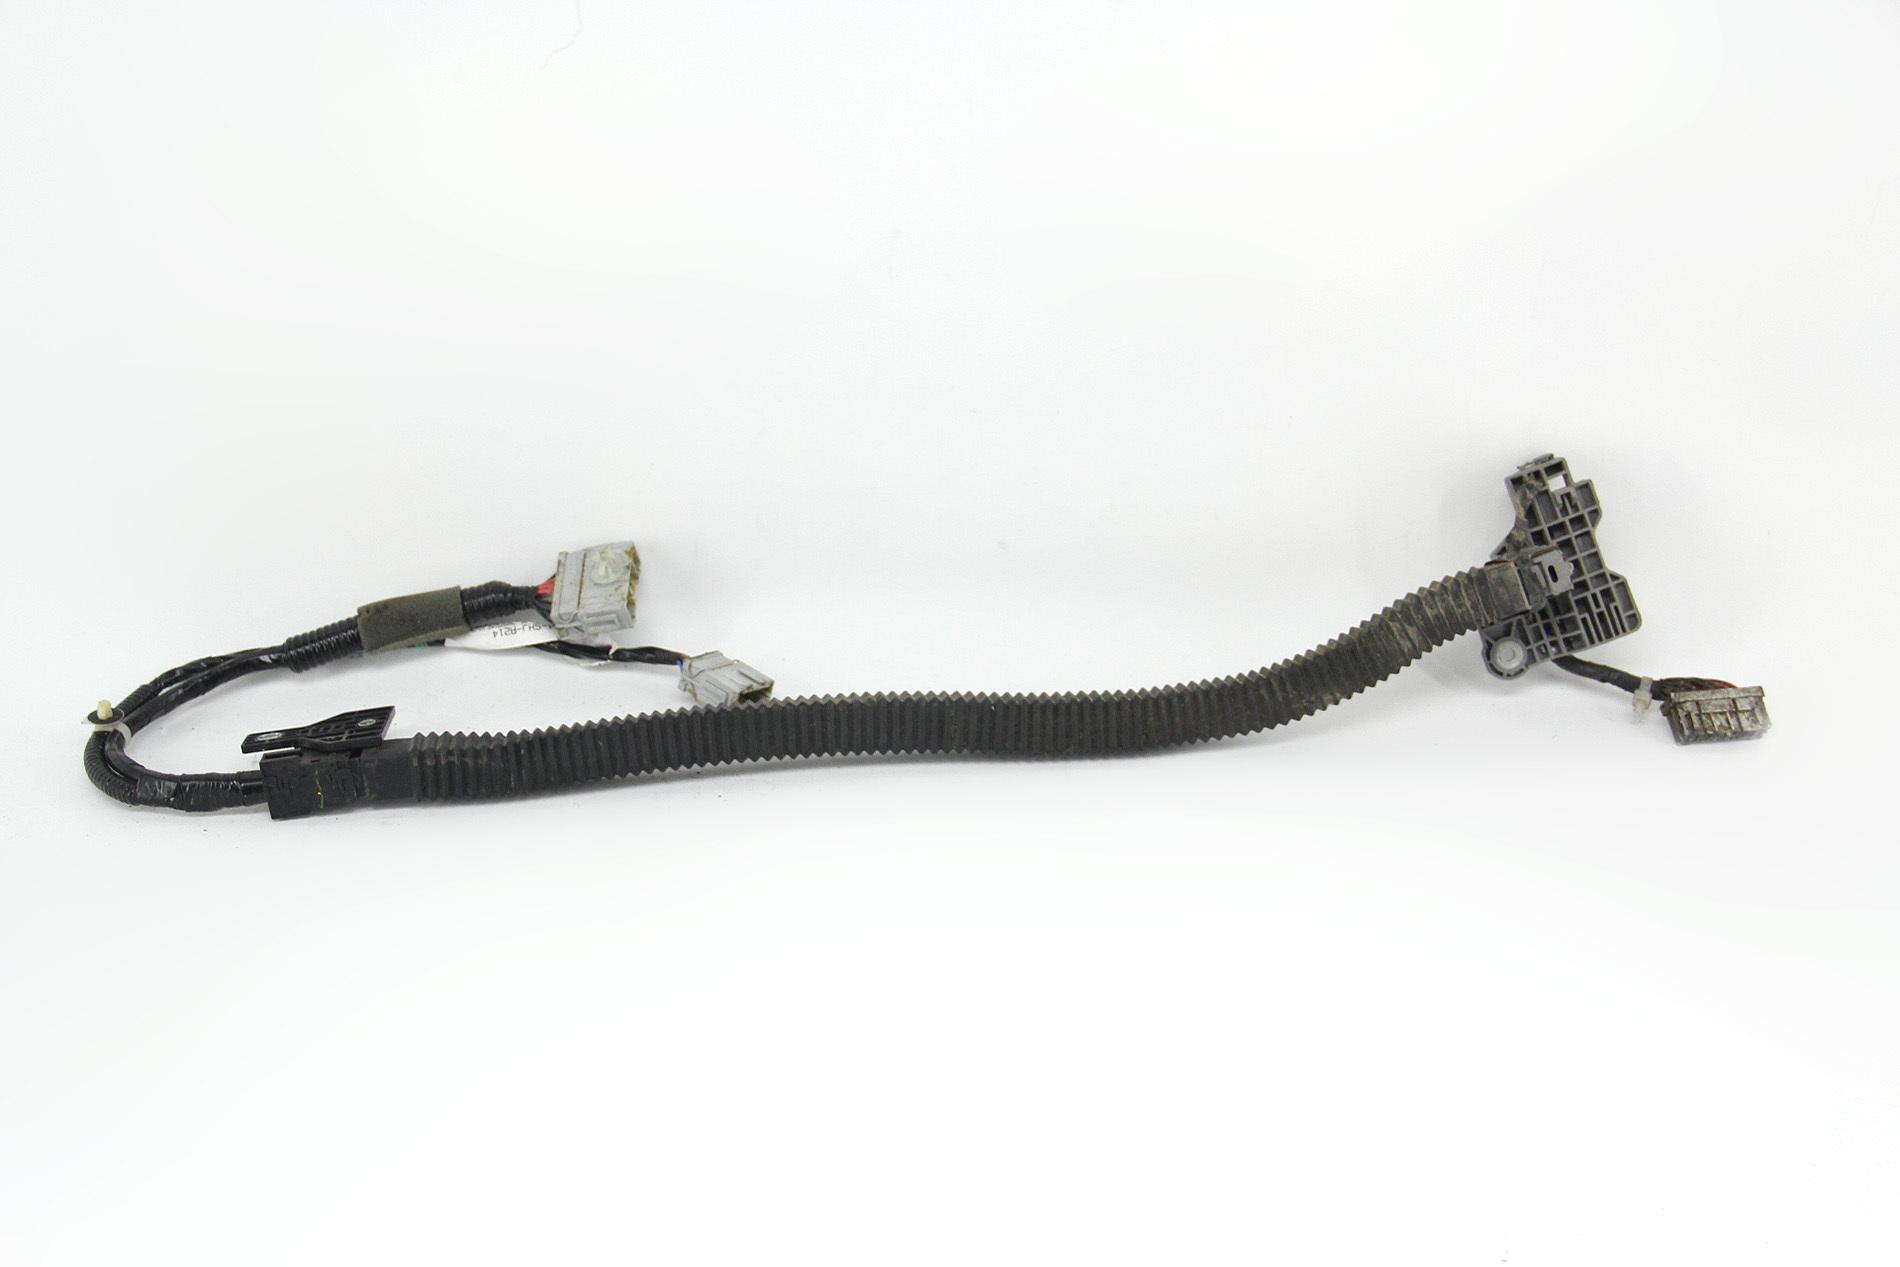 Honda Odyssey Left Sliding Door Cess Harness 72584 Shj A21 Oem 05 06 07 08 09 10 Extreme Auto Parts